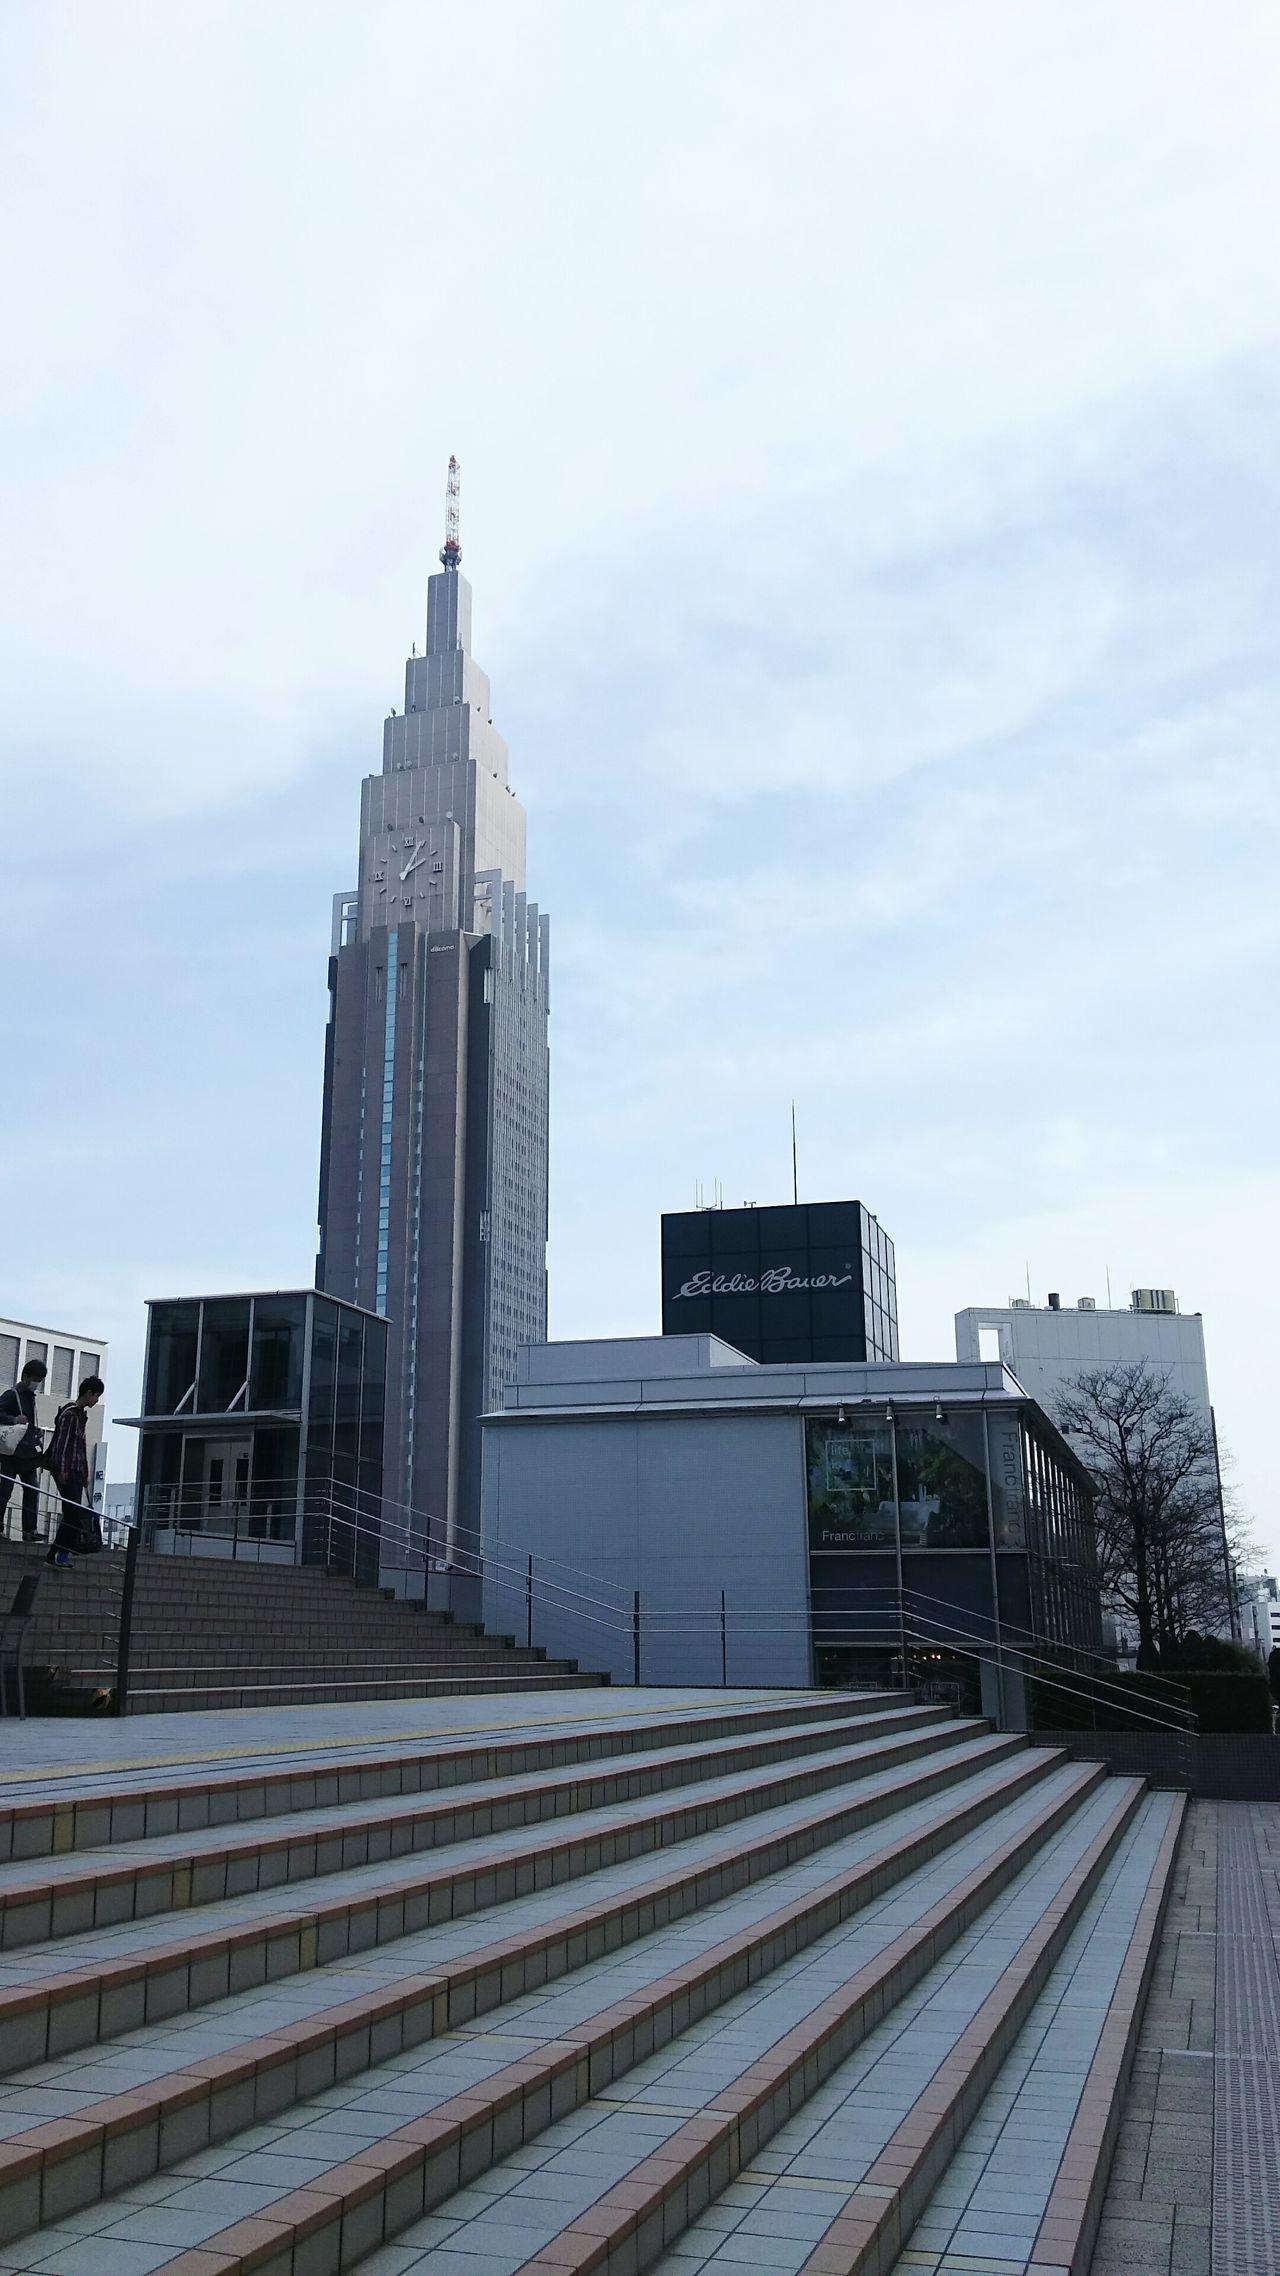 Streetphotography Walking Around Bilding Tower Snapshot Smartphonephotography